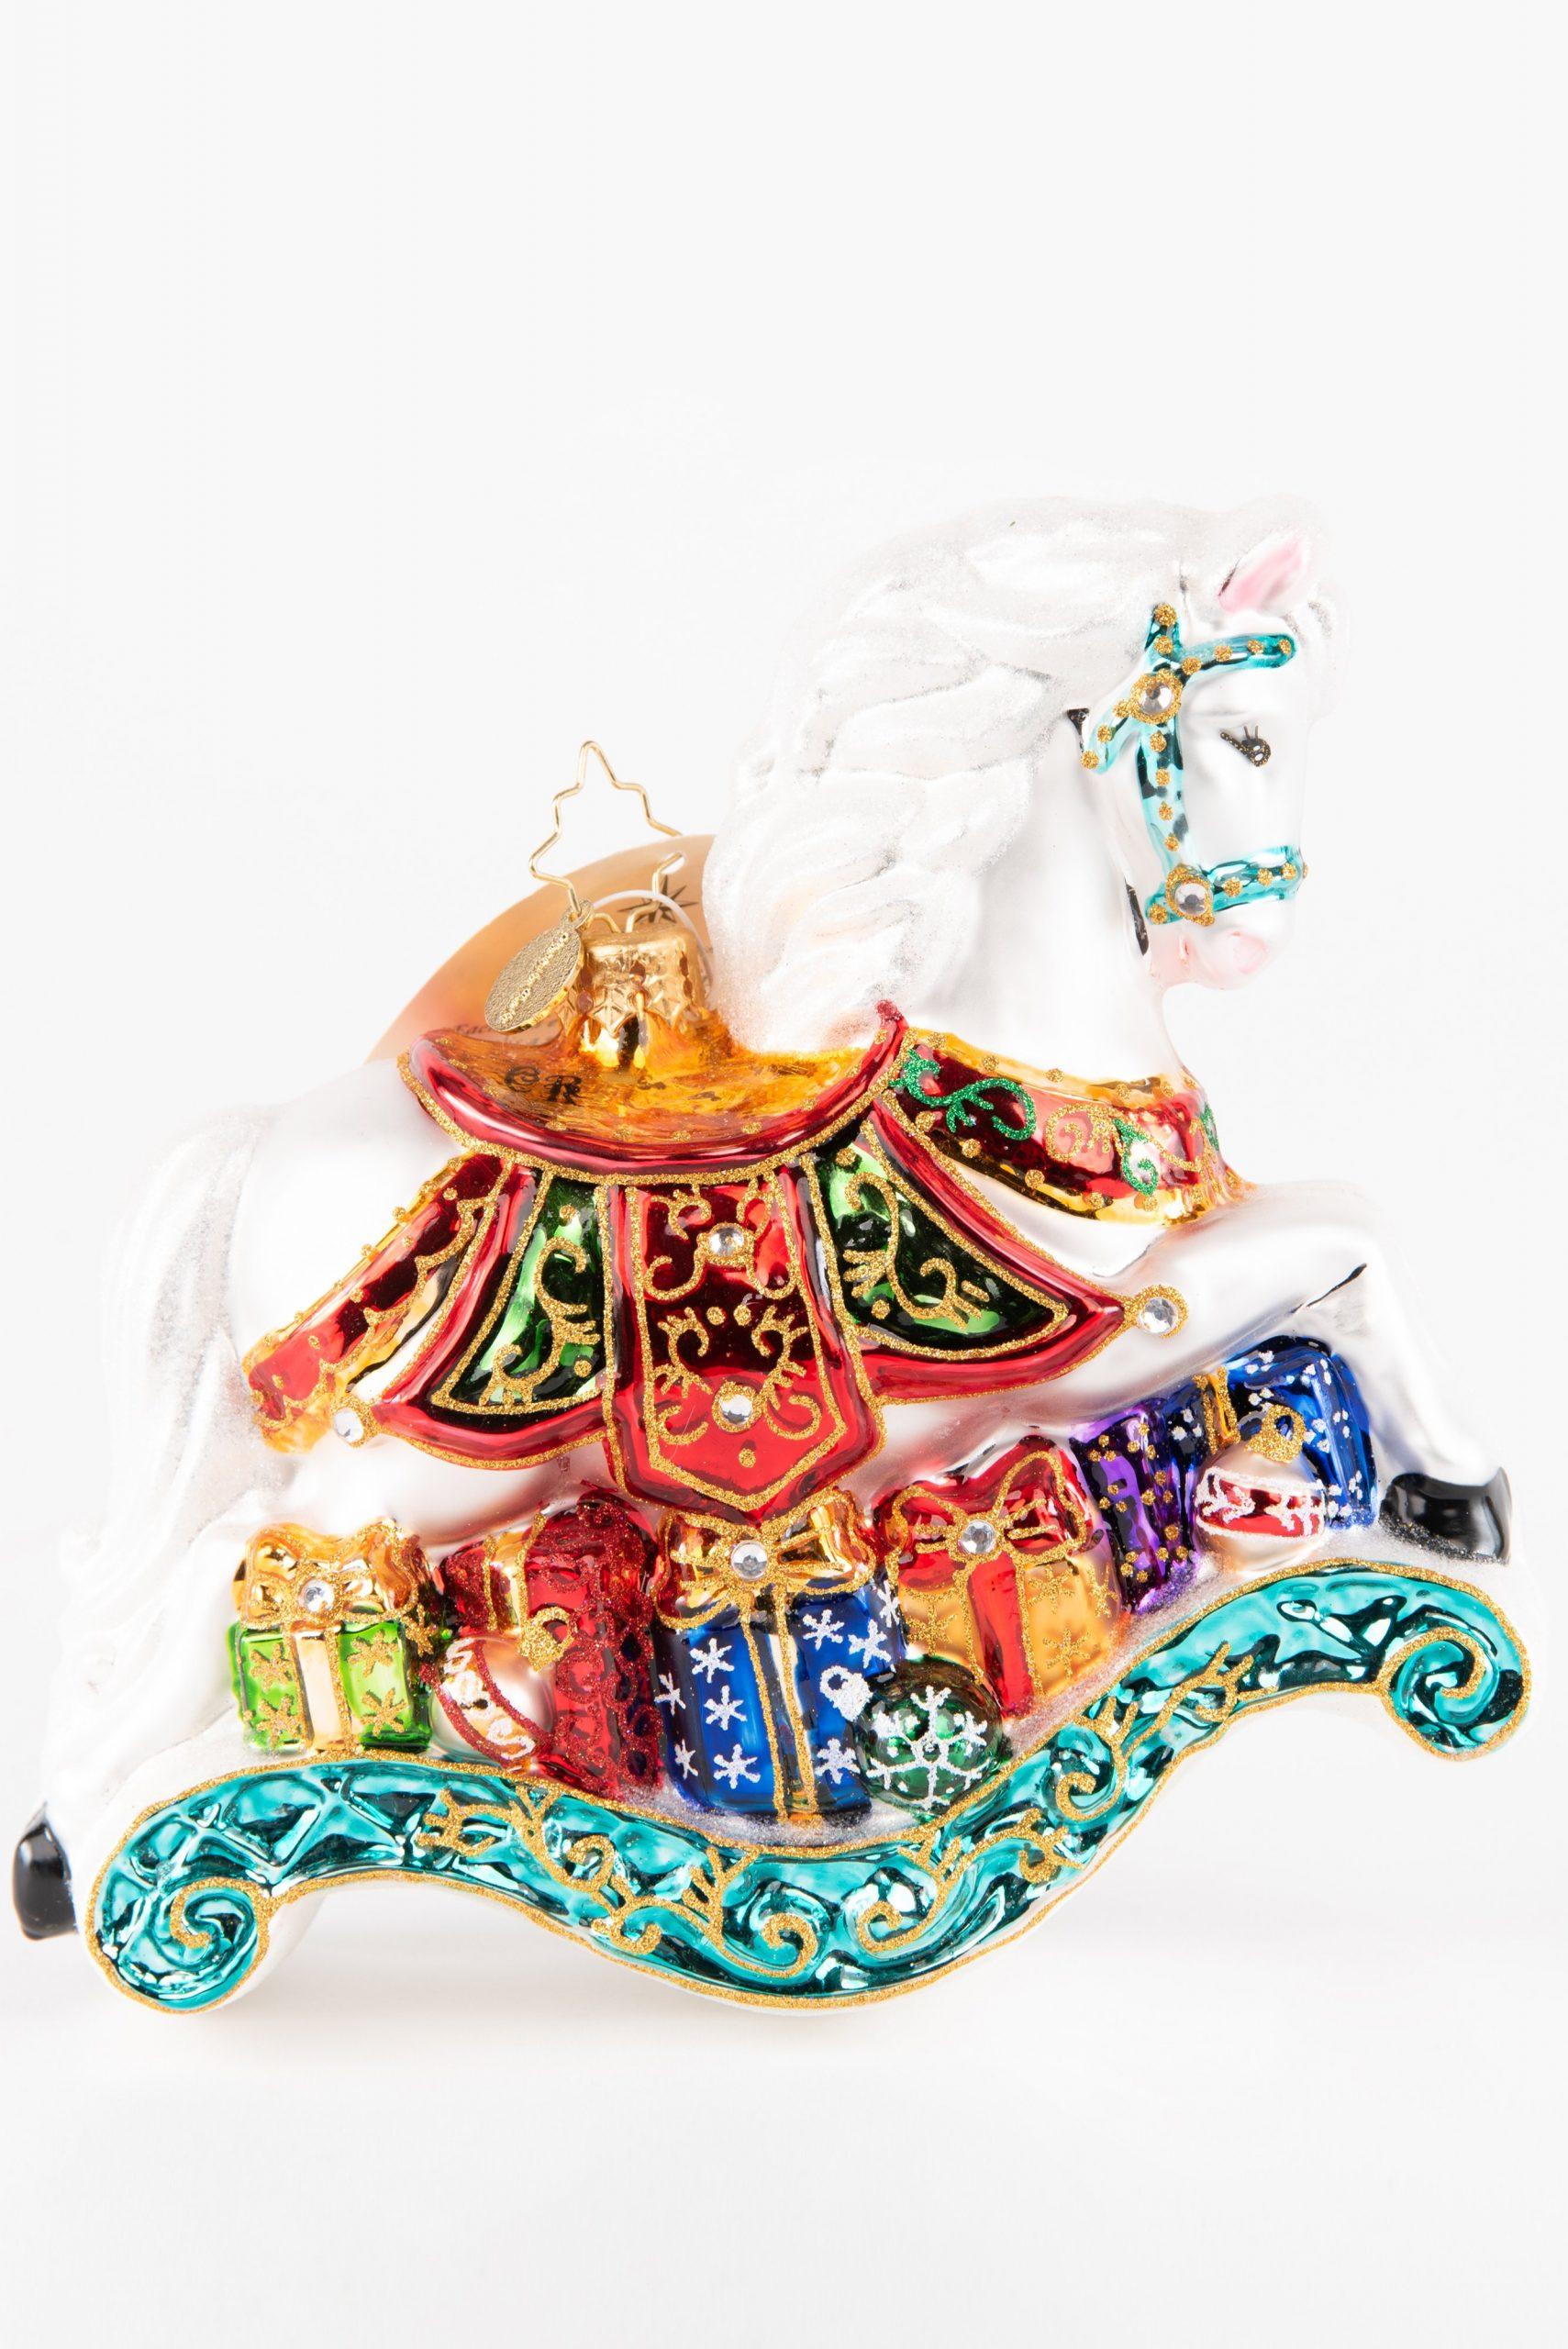 Christopher Radko Rocking Horse Ornament